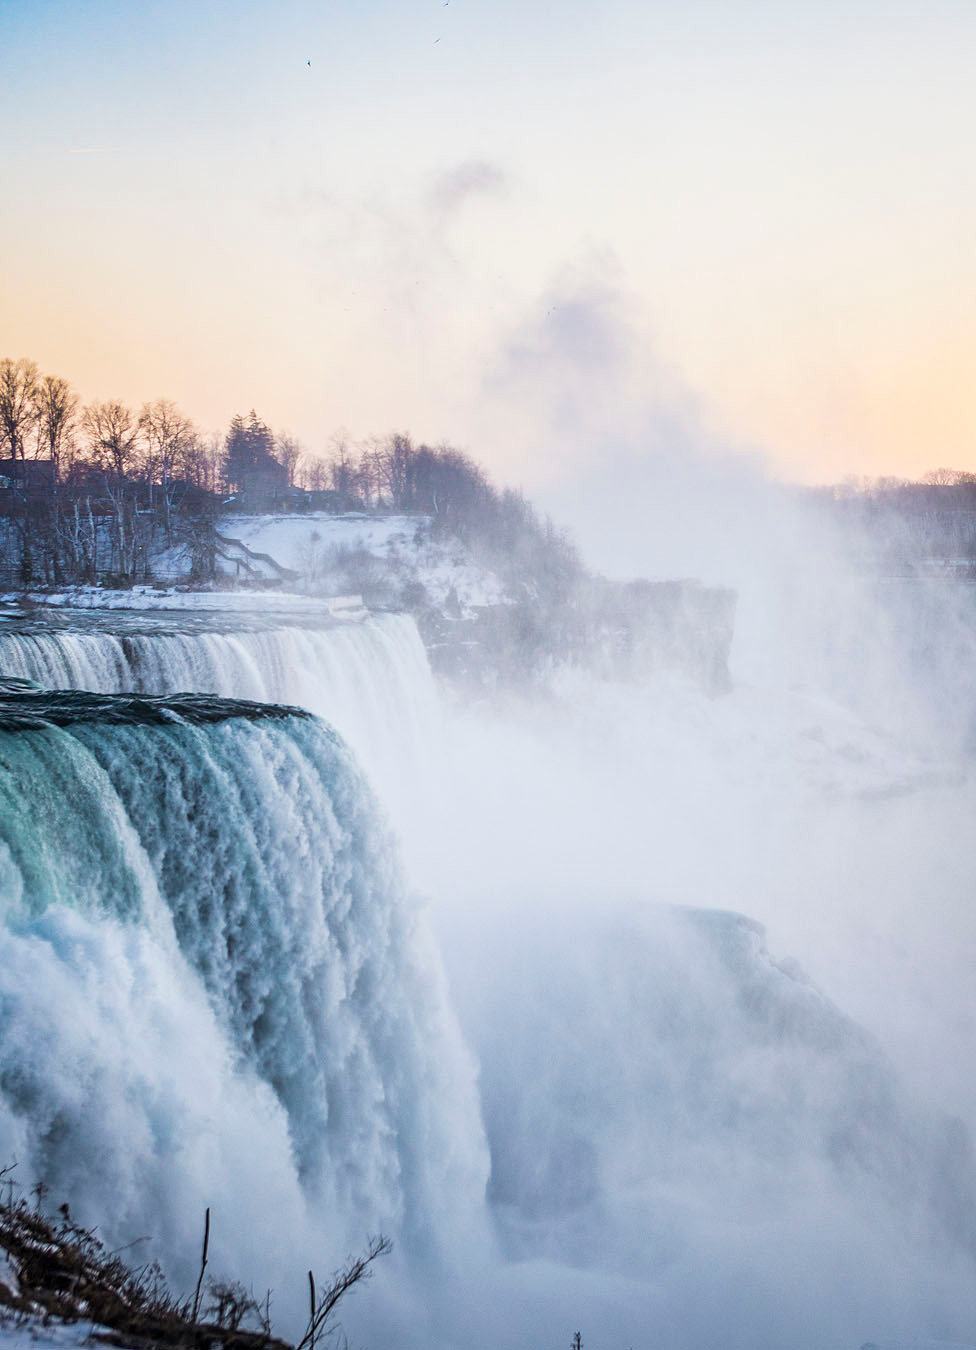 Mist over winter Niagara Falls at sunset